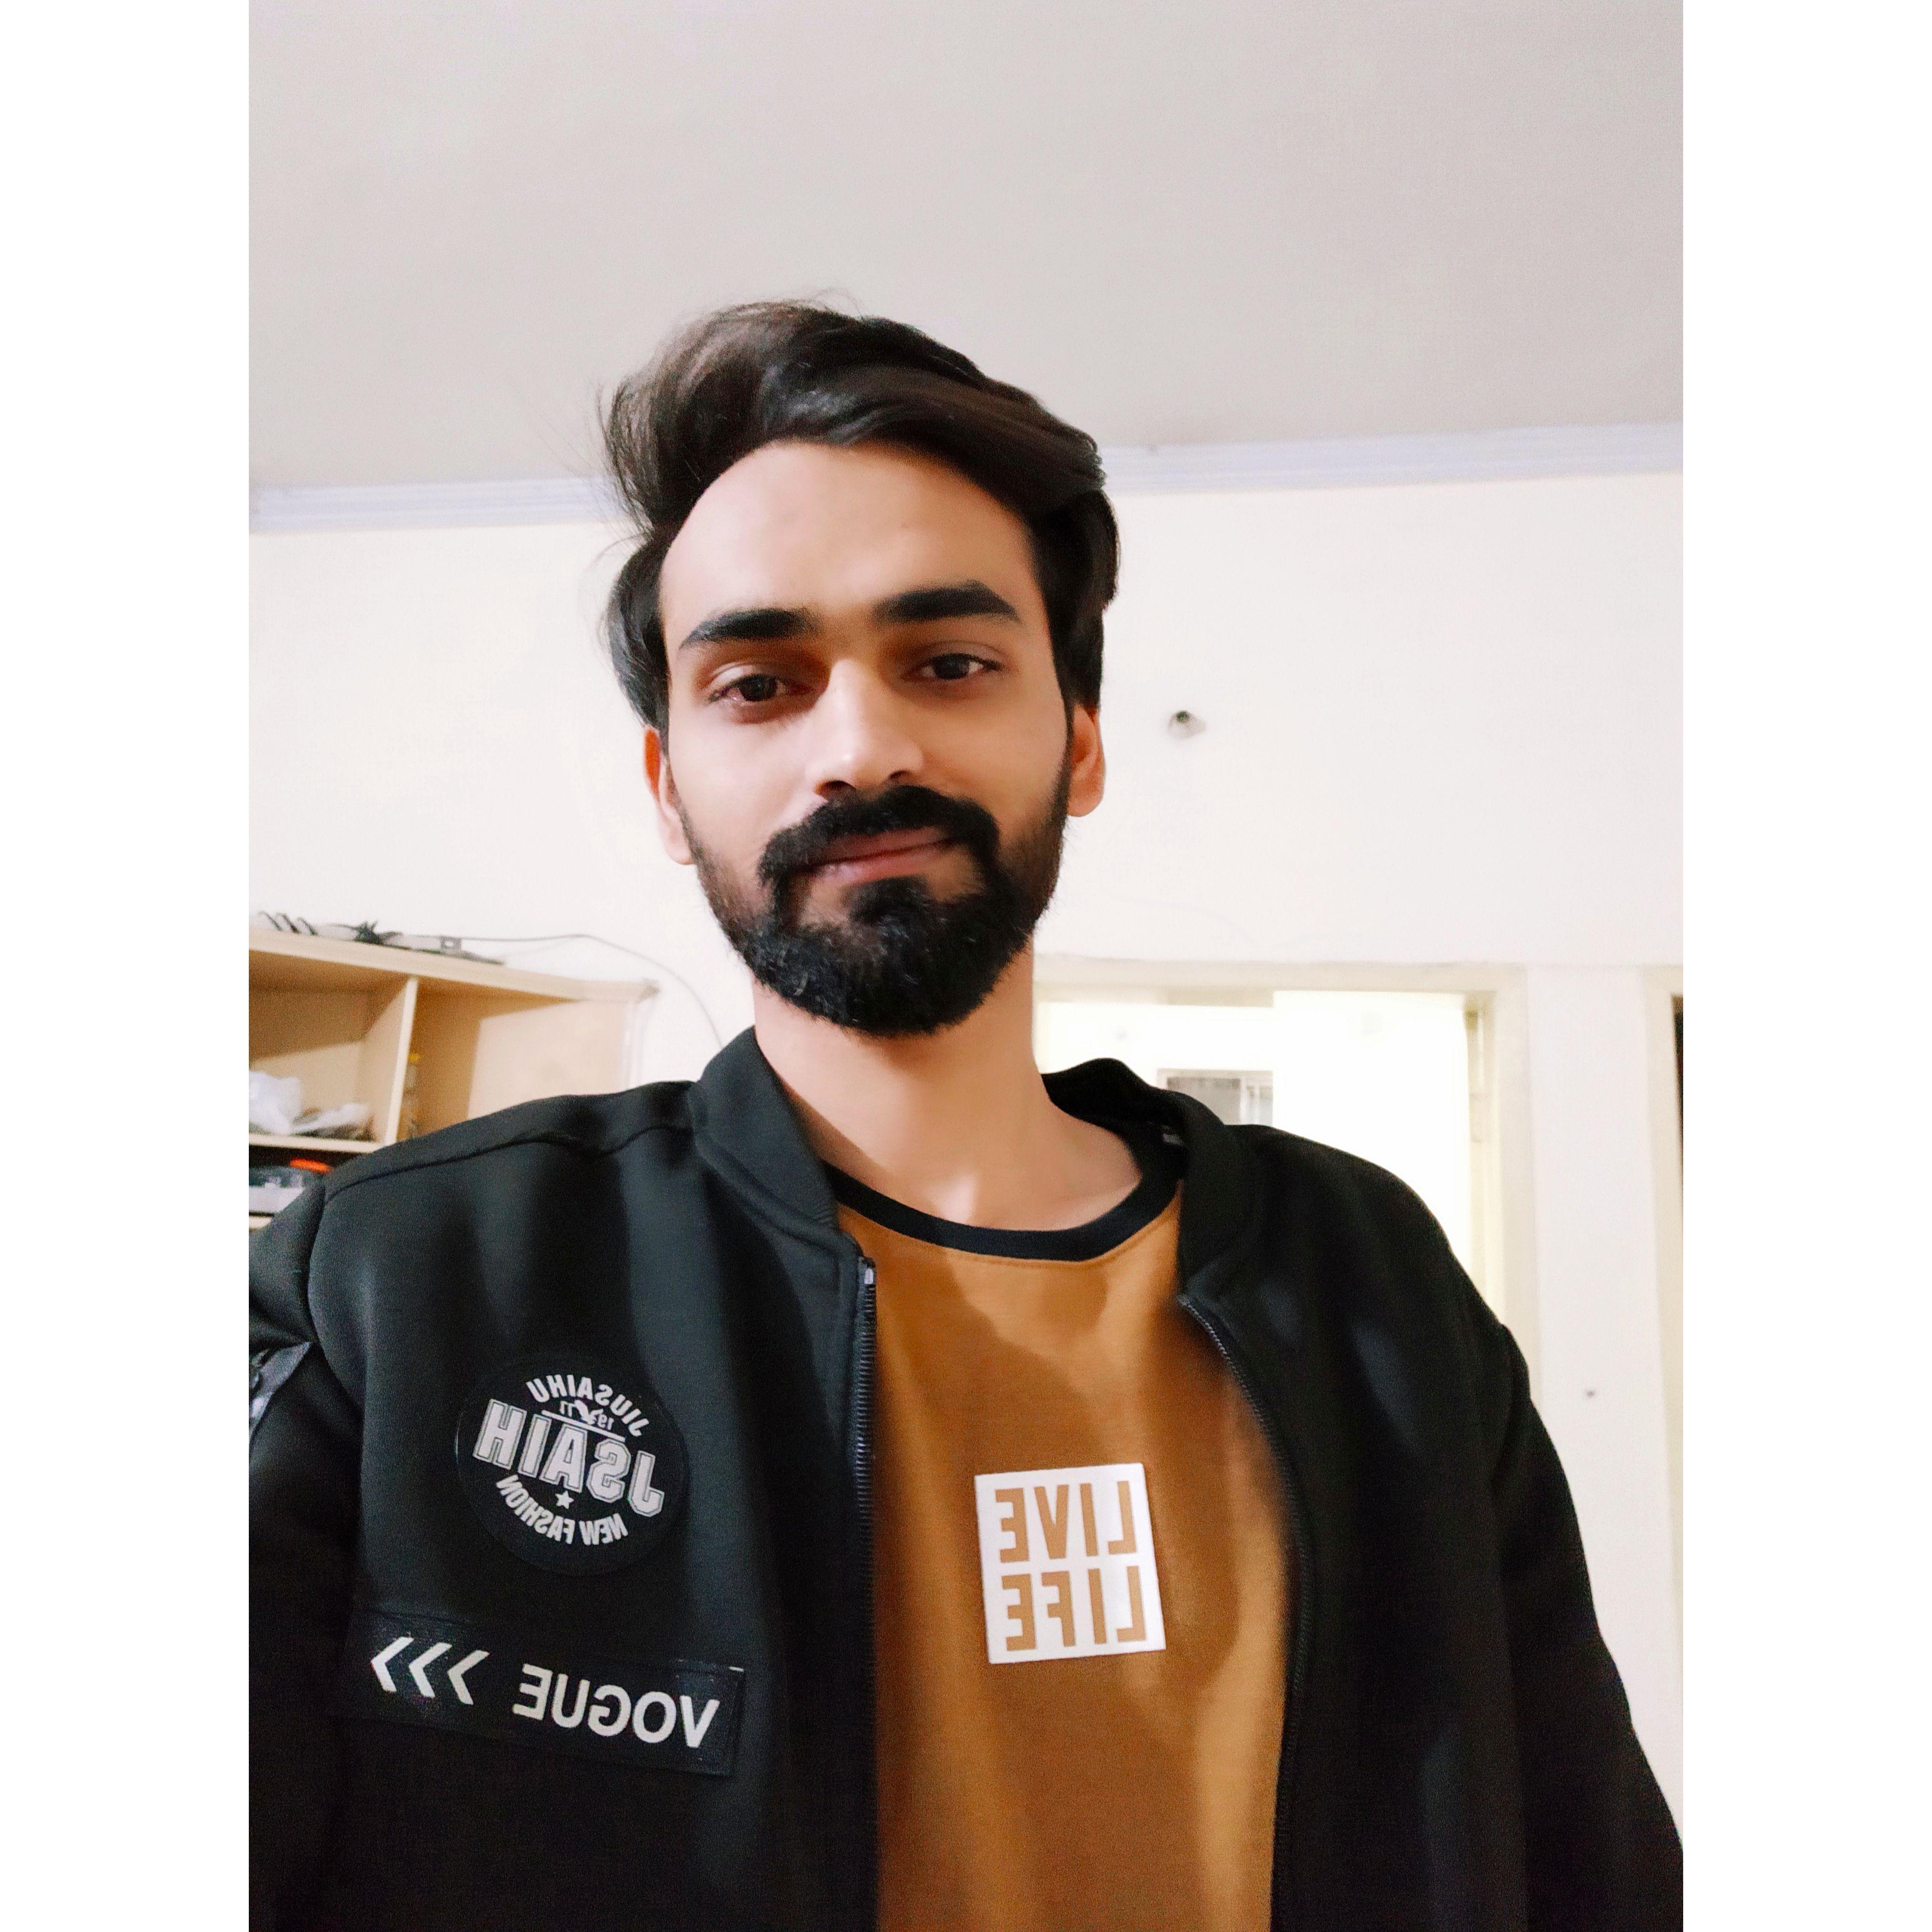 Shahmeer Khan Hacker Noon profile picture